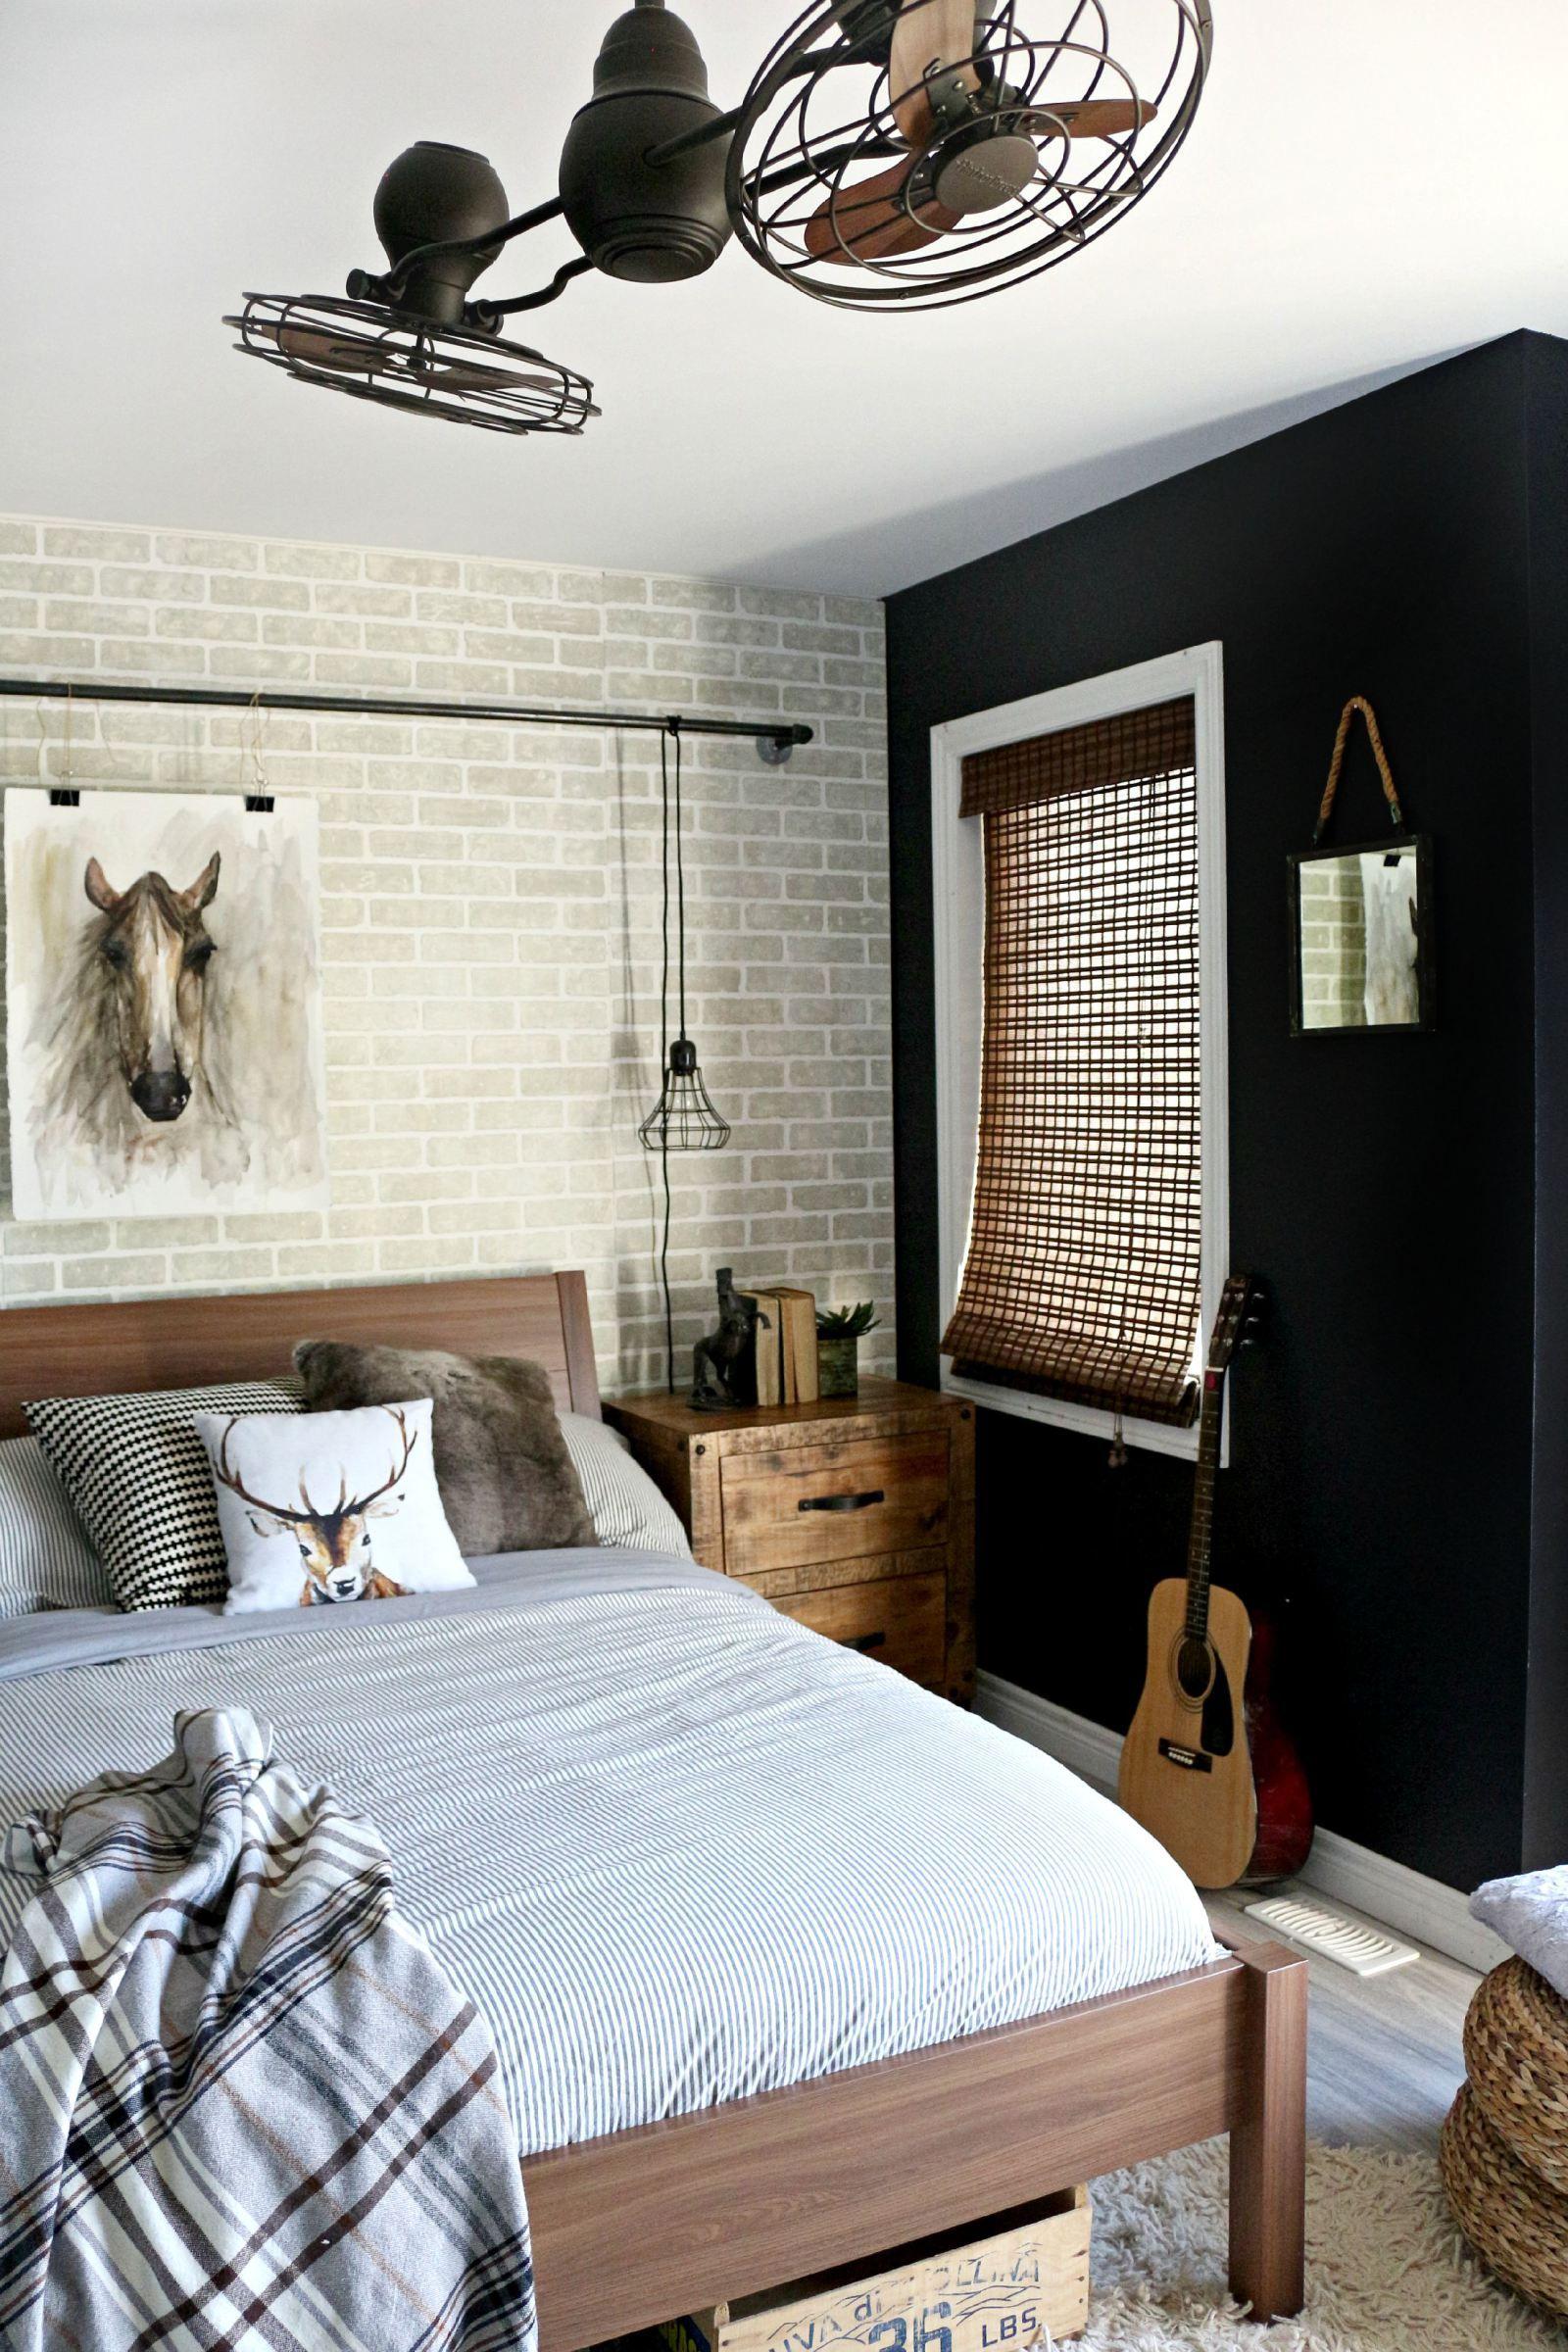 p grey boy ideas modern remarkable kids on rooms best images pinterest teen boys bedroom about design